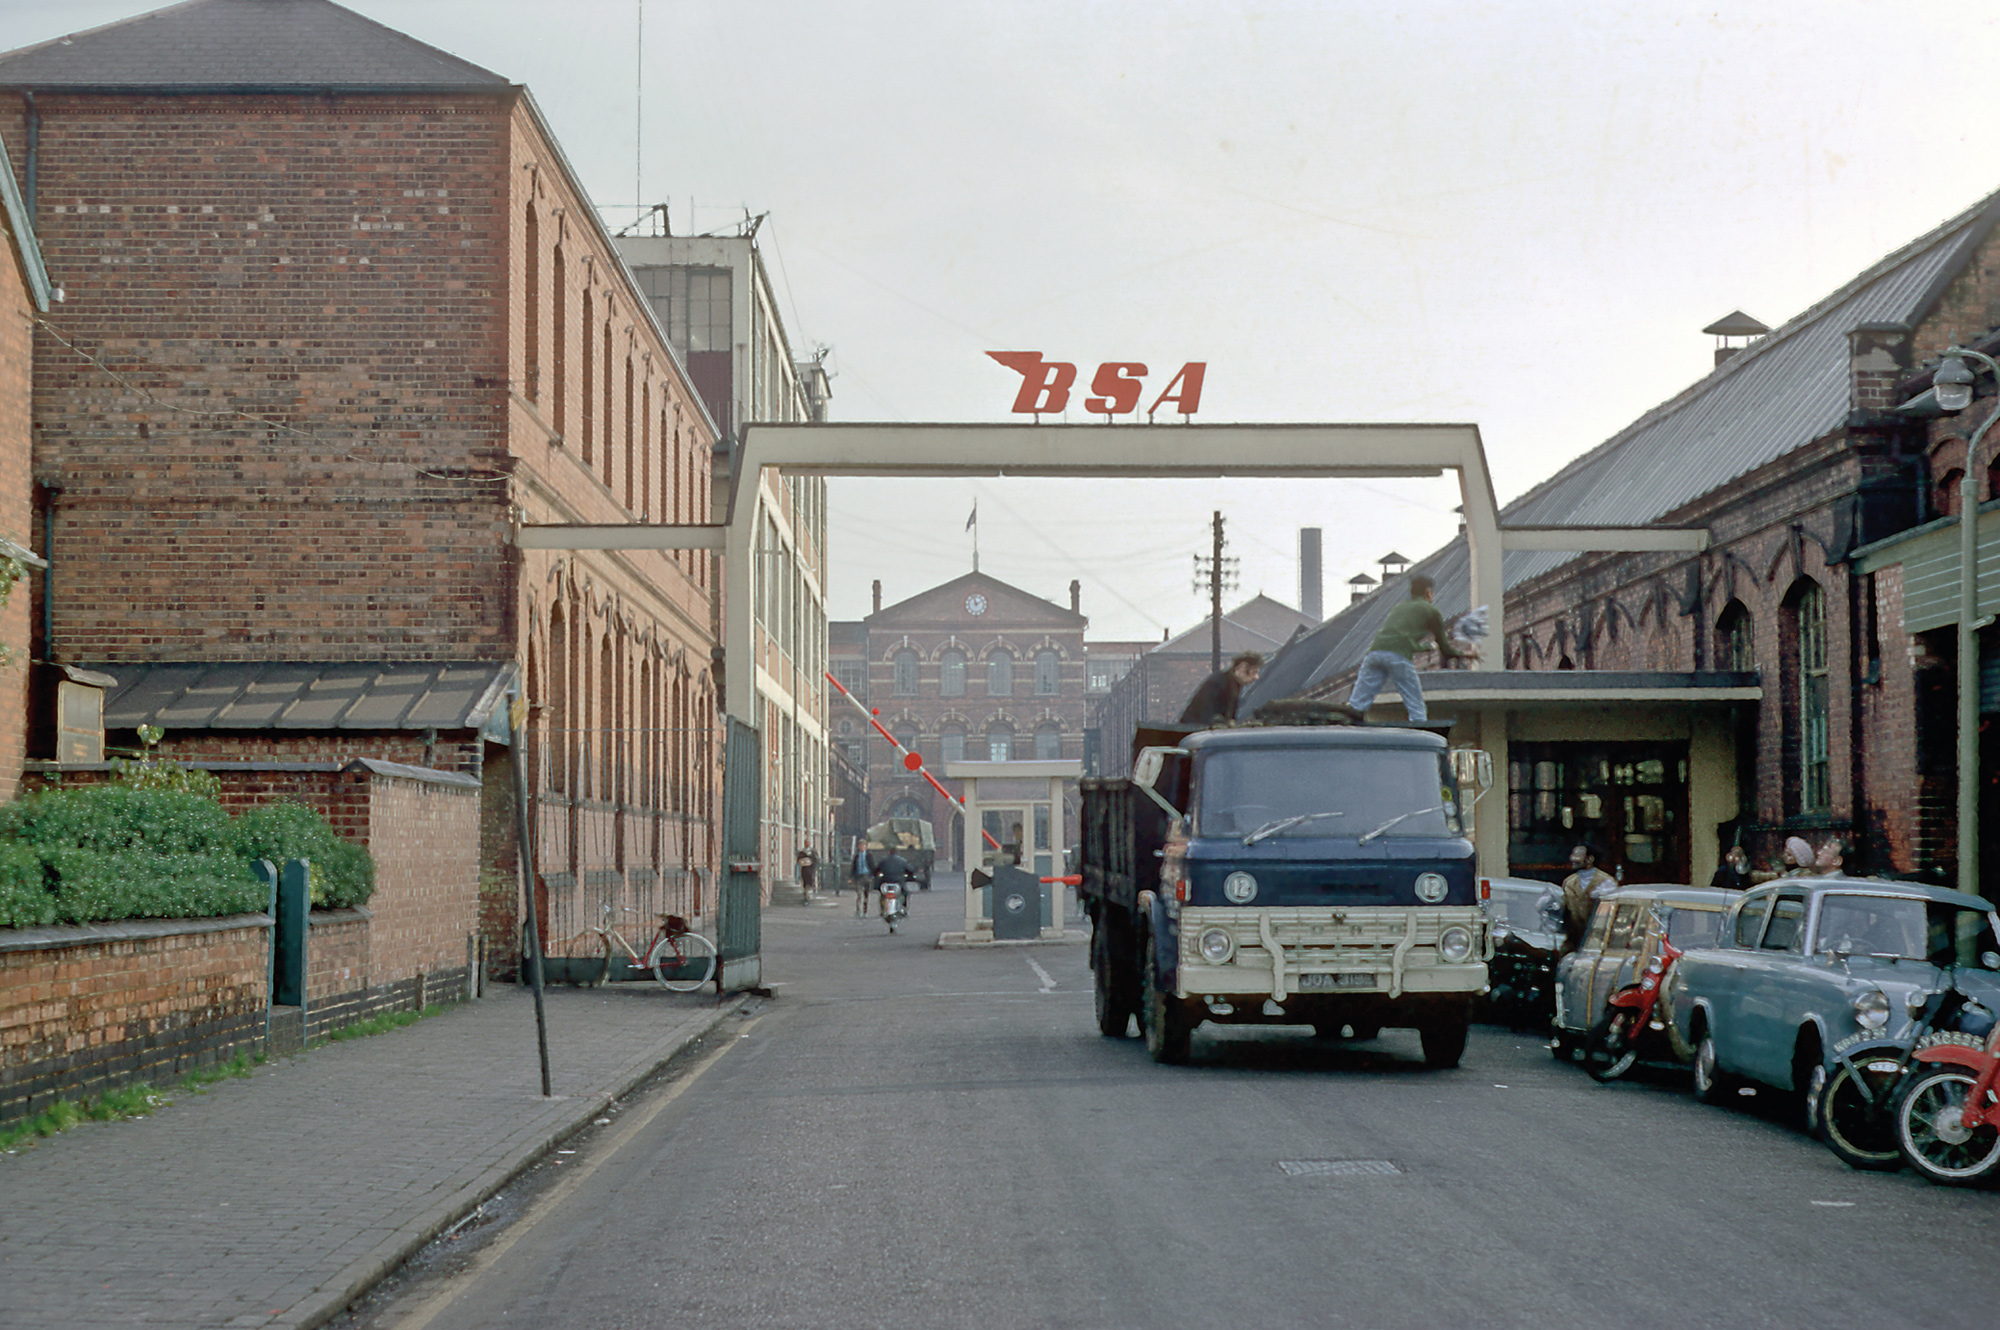 BSA Works, Armoury Road, Small Heath, 1968